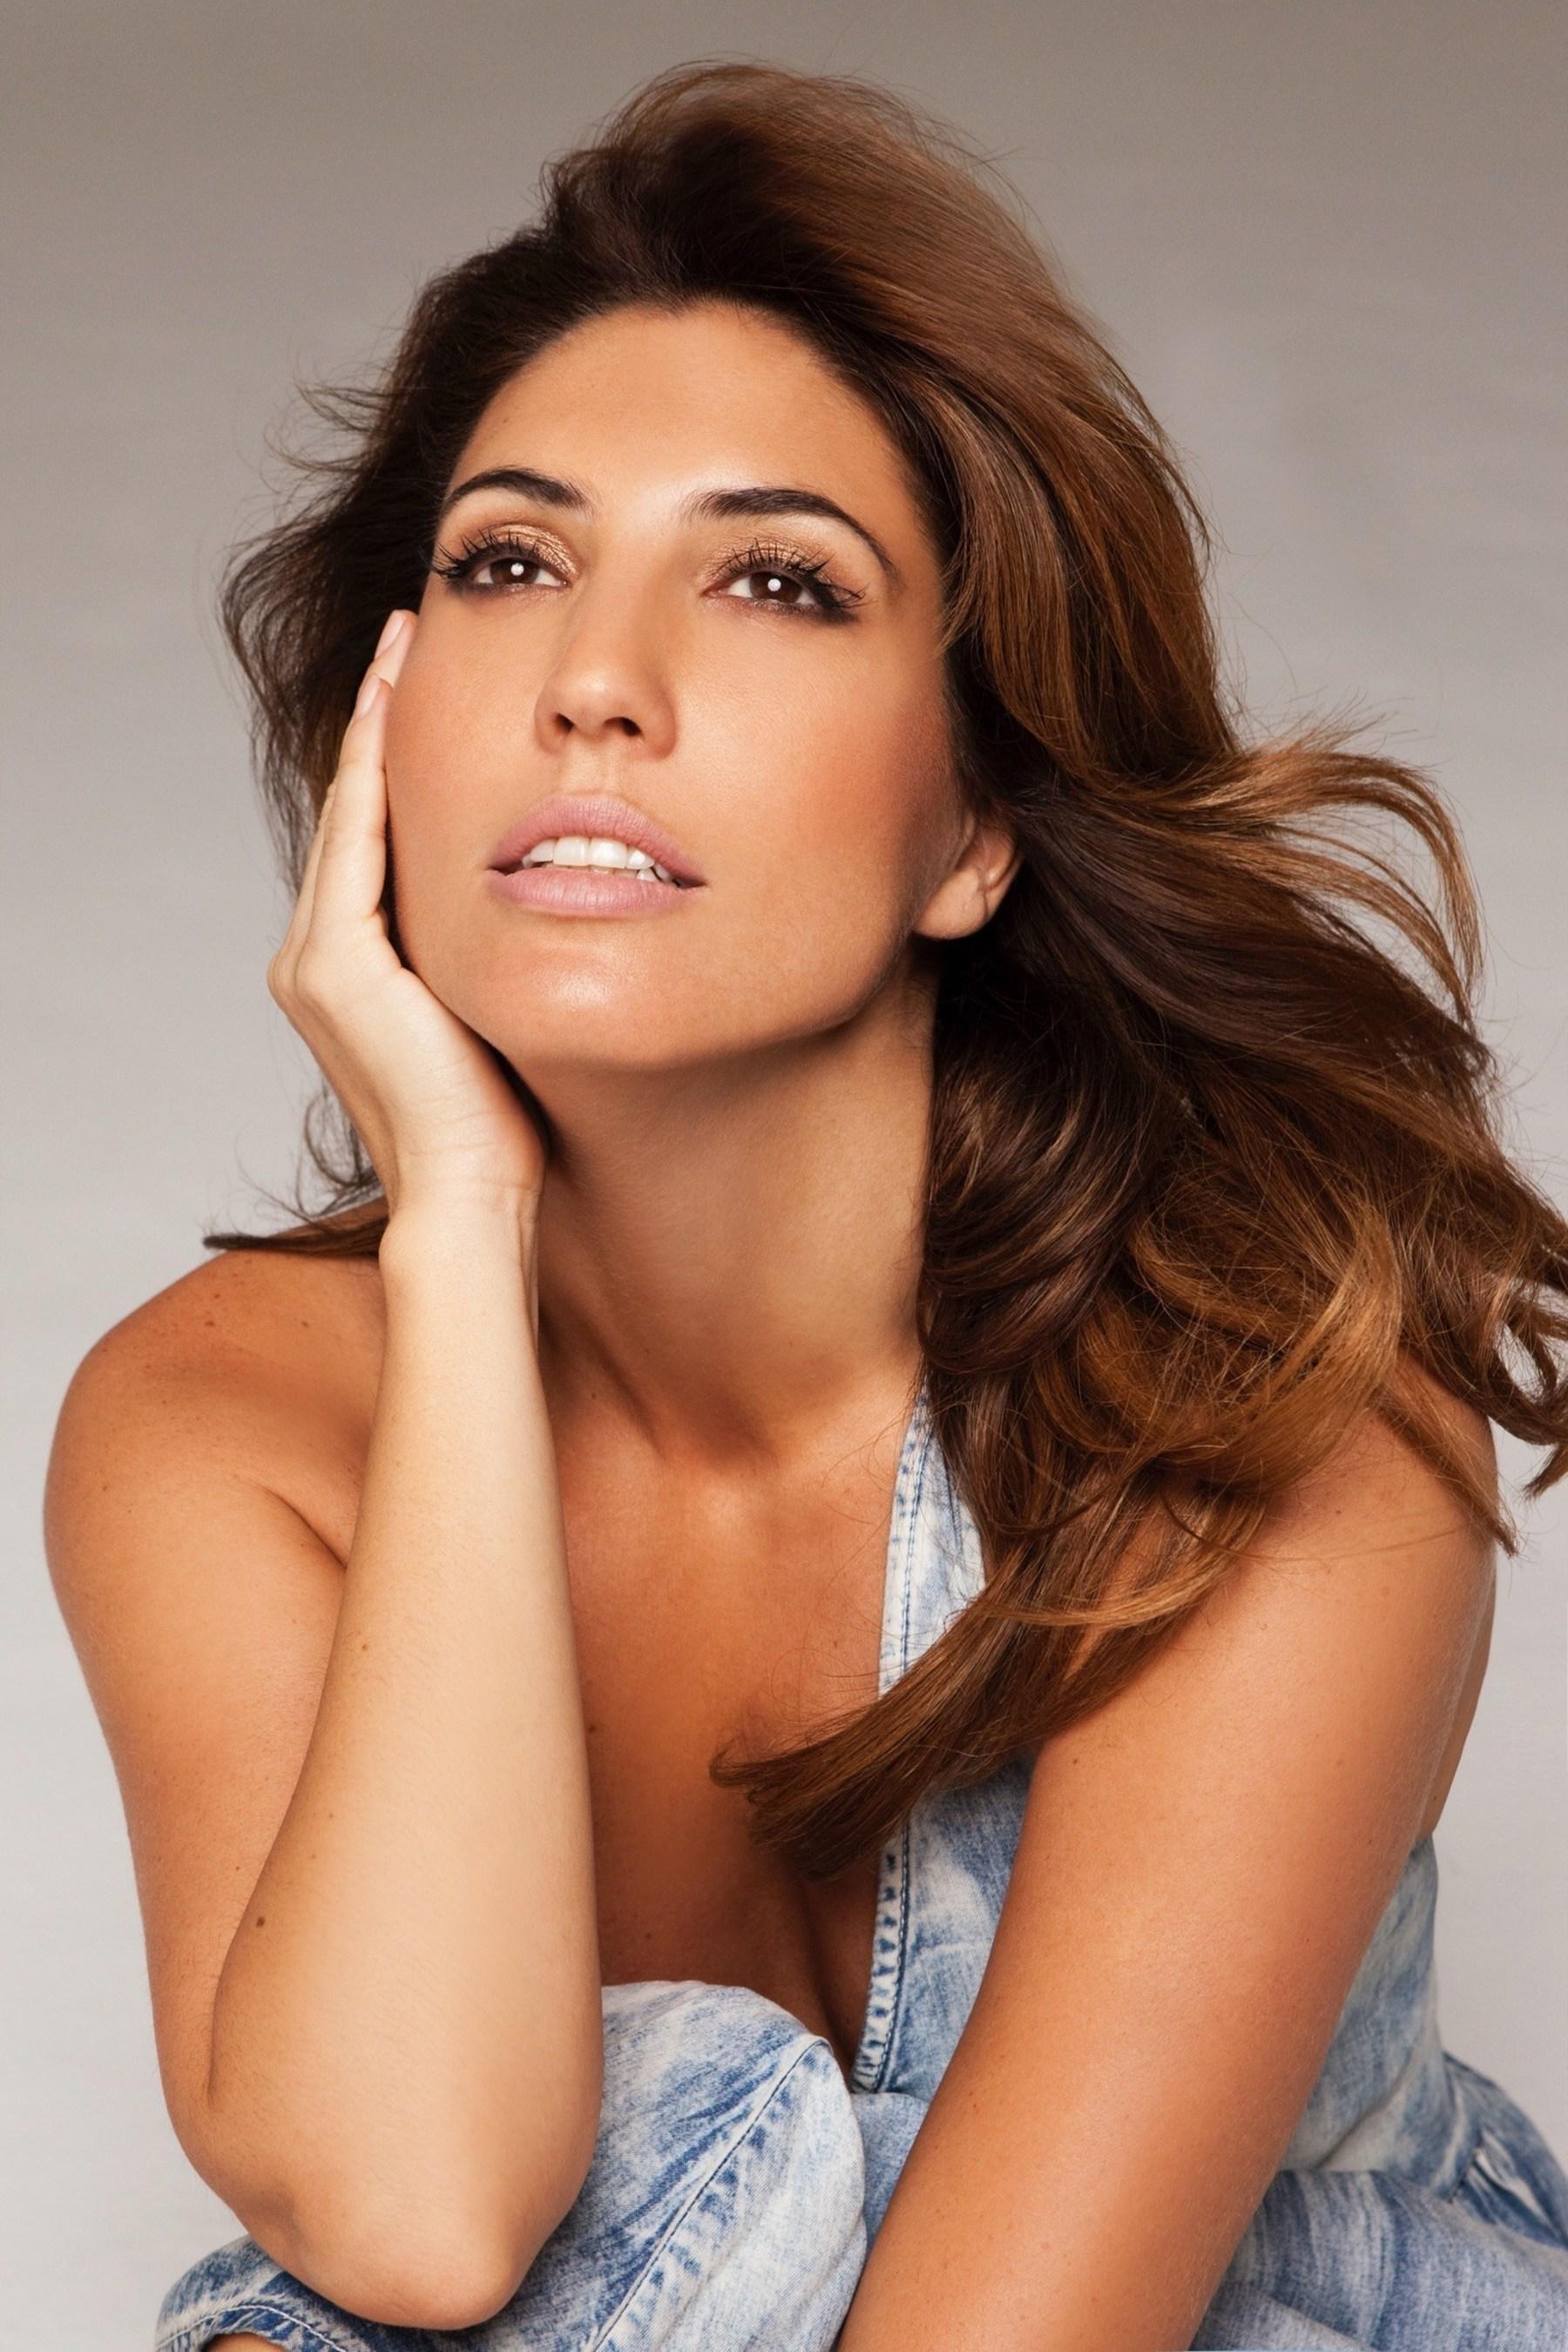 Columbus Citizens Foundation Announces Arianna Bergamaschi As 2016 Gala Guest Entertainer